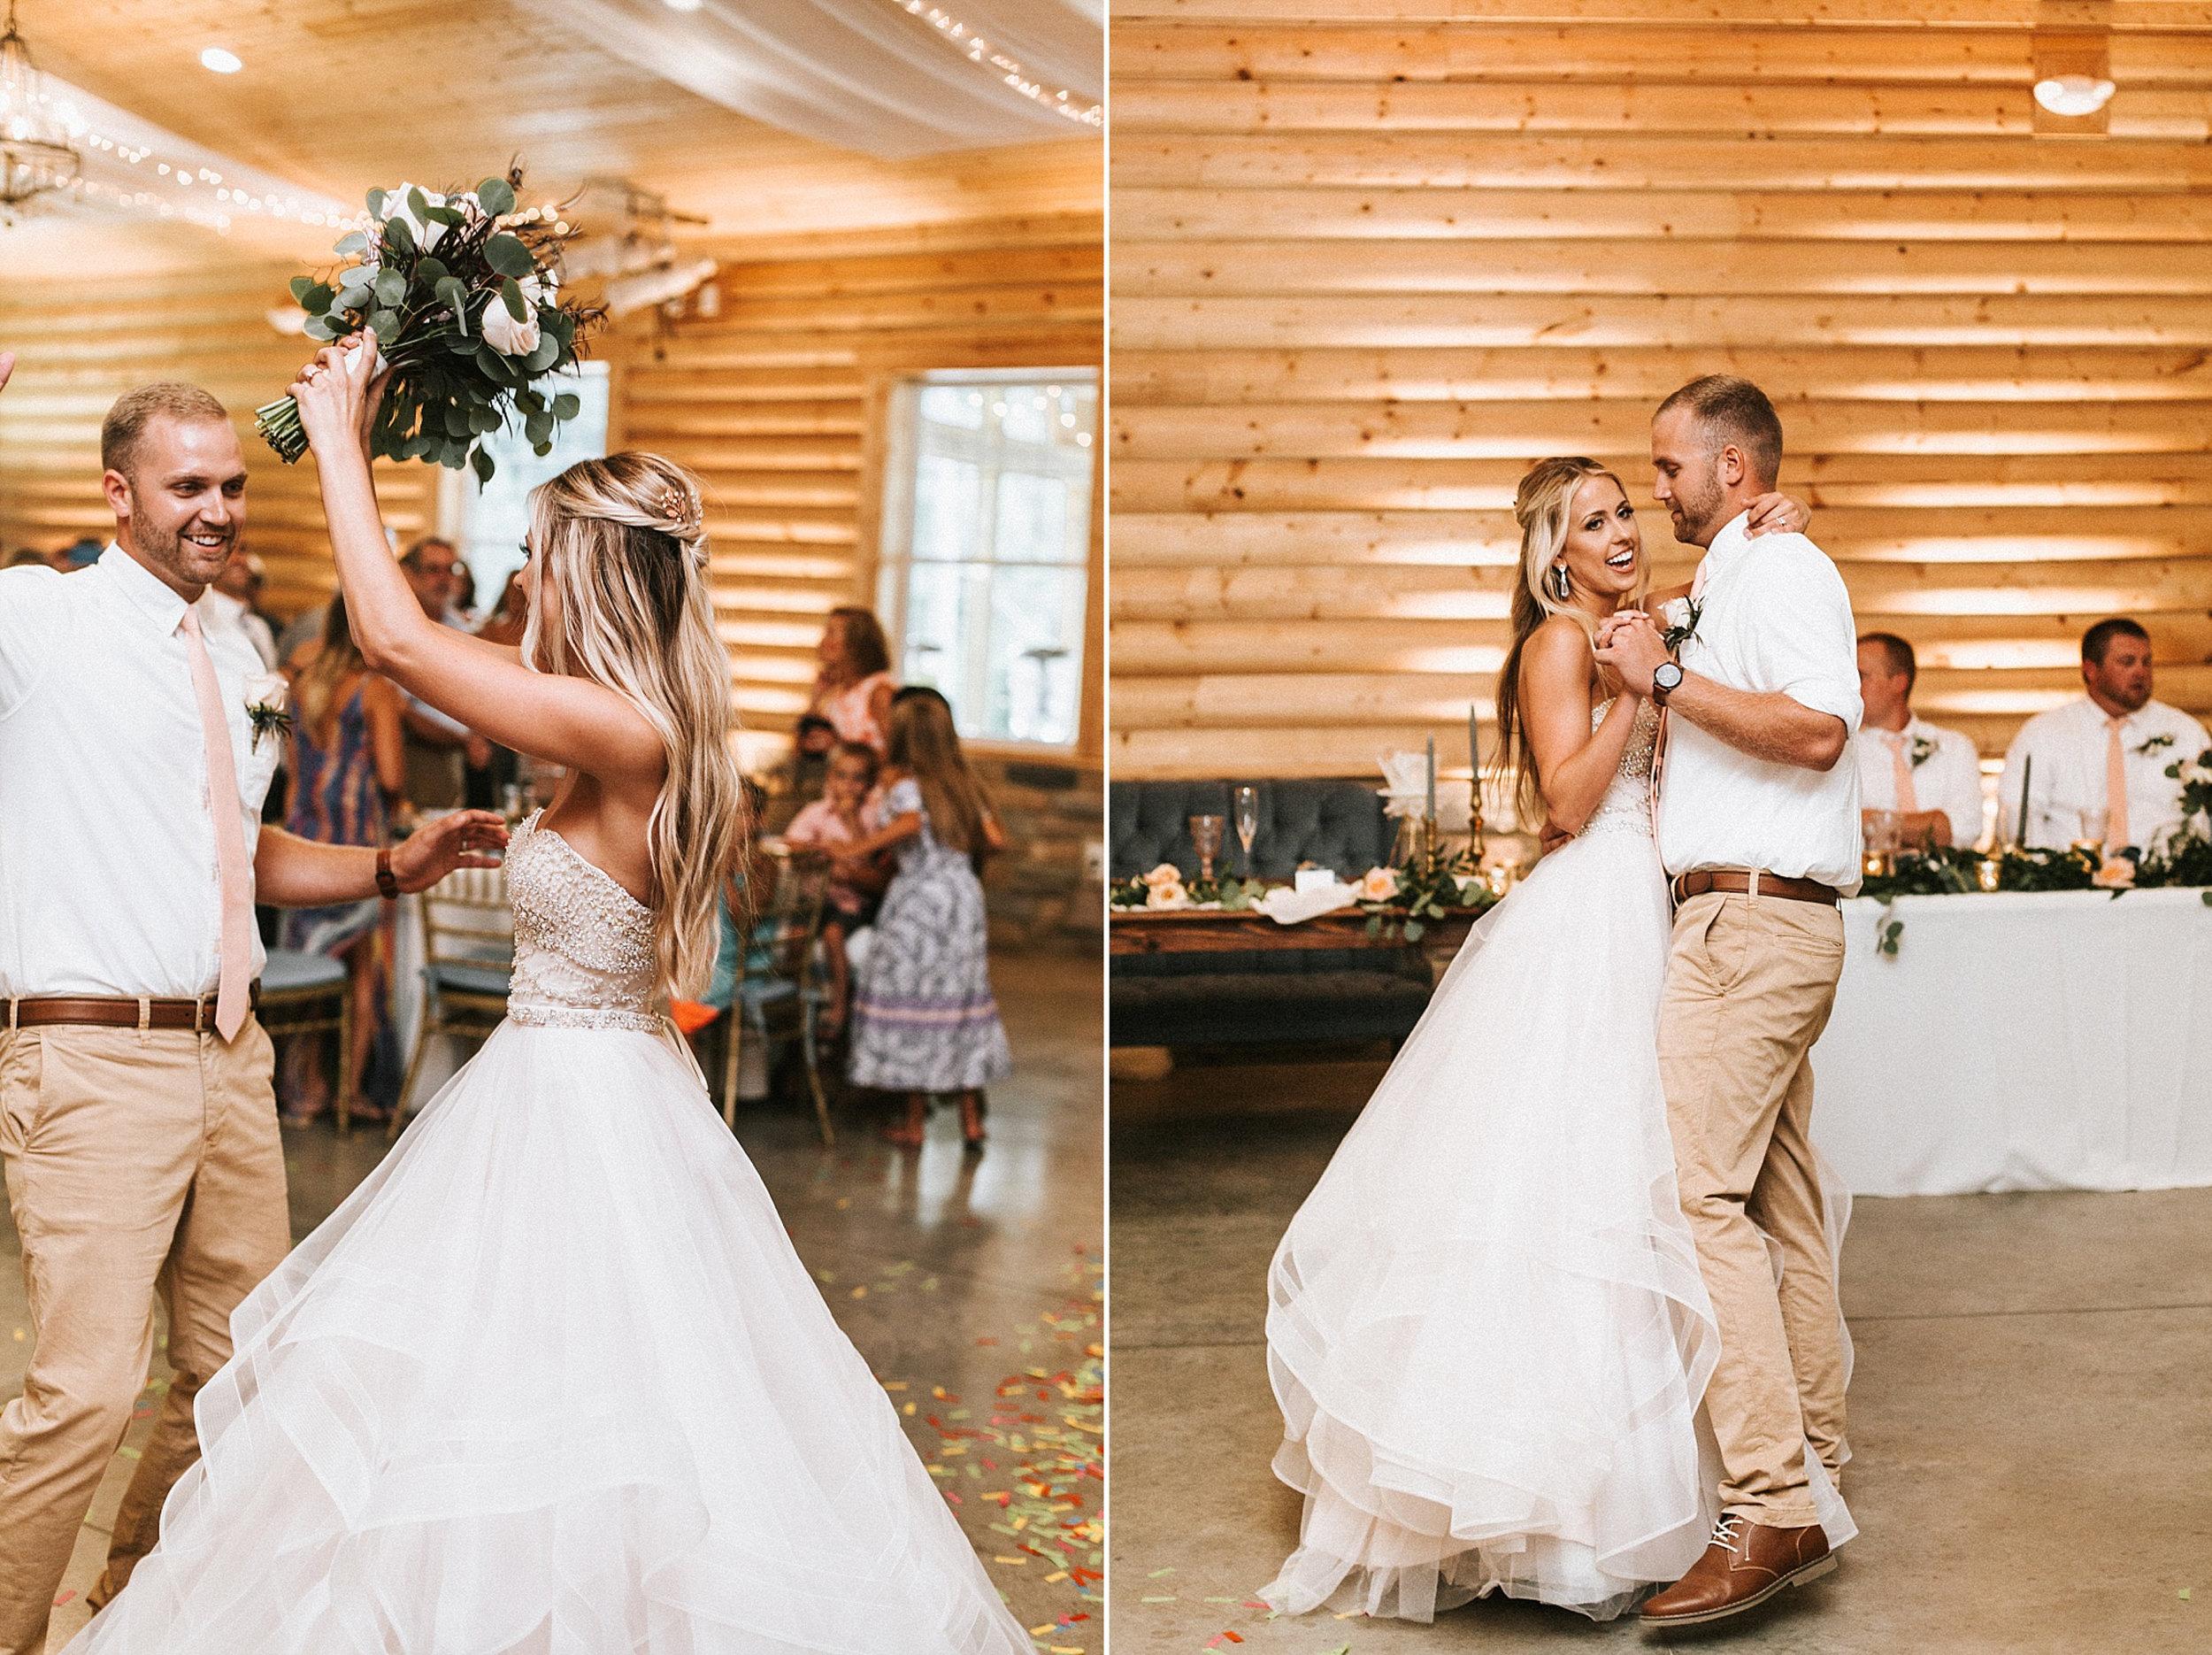 Brooke Townsend Photography - Cincinnati Wedding Photographer (127 of 153).jpg